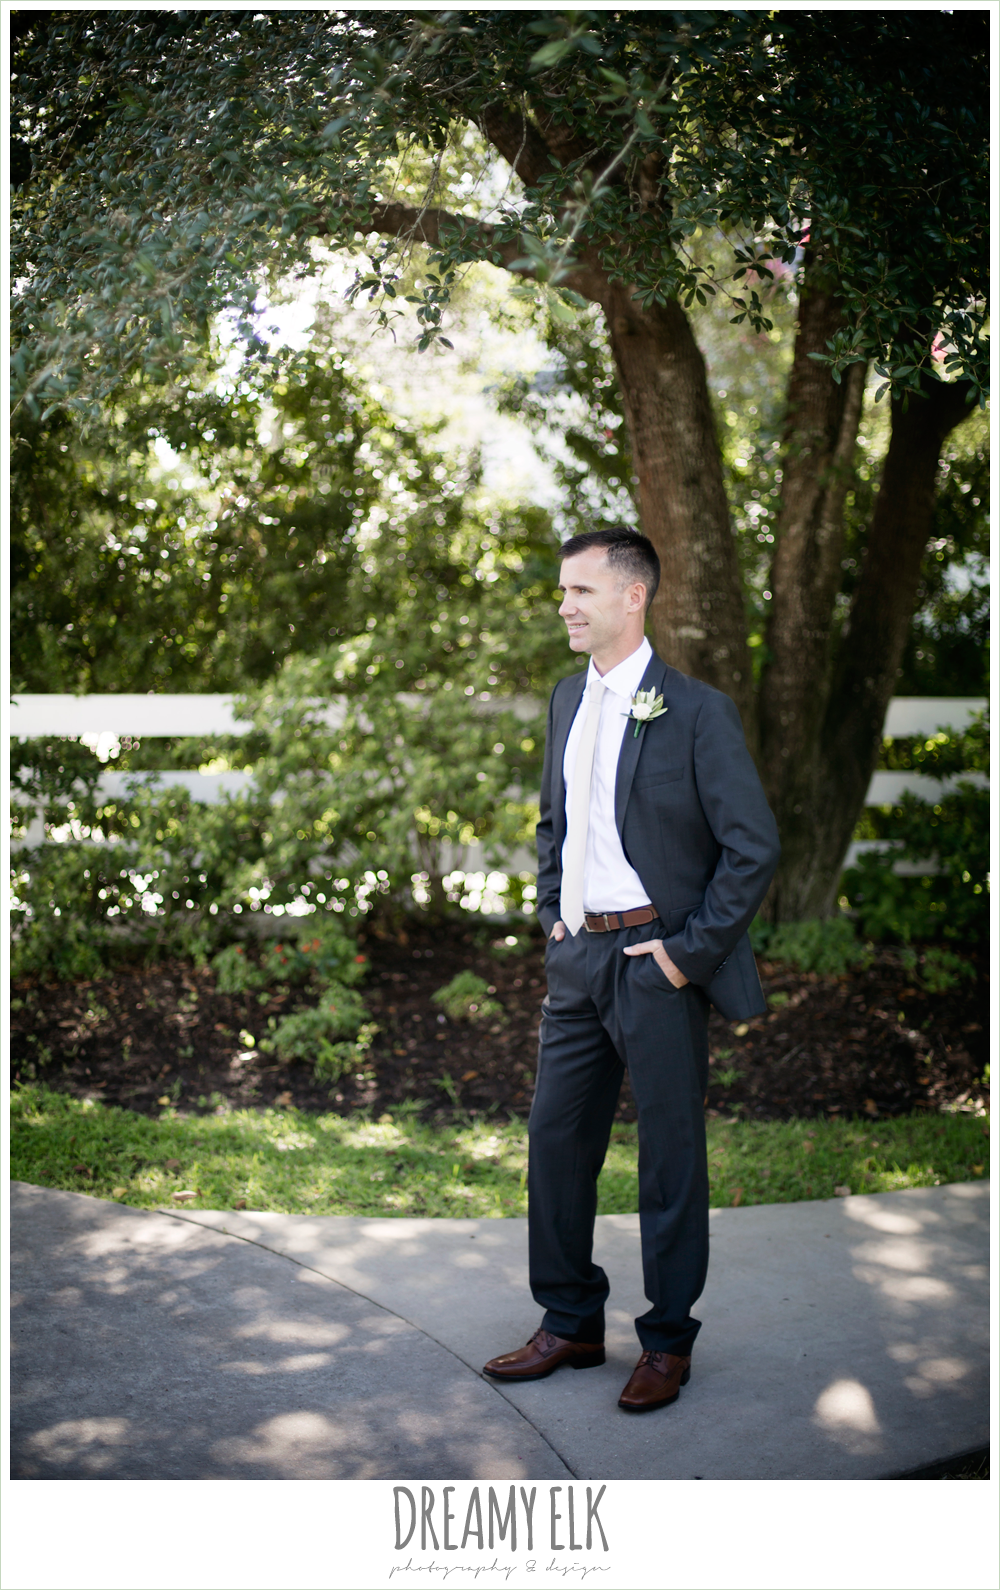 outdoor groom photo, hugo boss groom's suit, july summer morning wedding, ashelynn manor, magnolia, texas {dreamy elk photography and design}